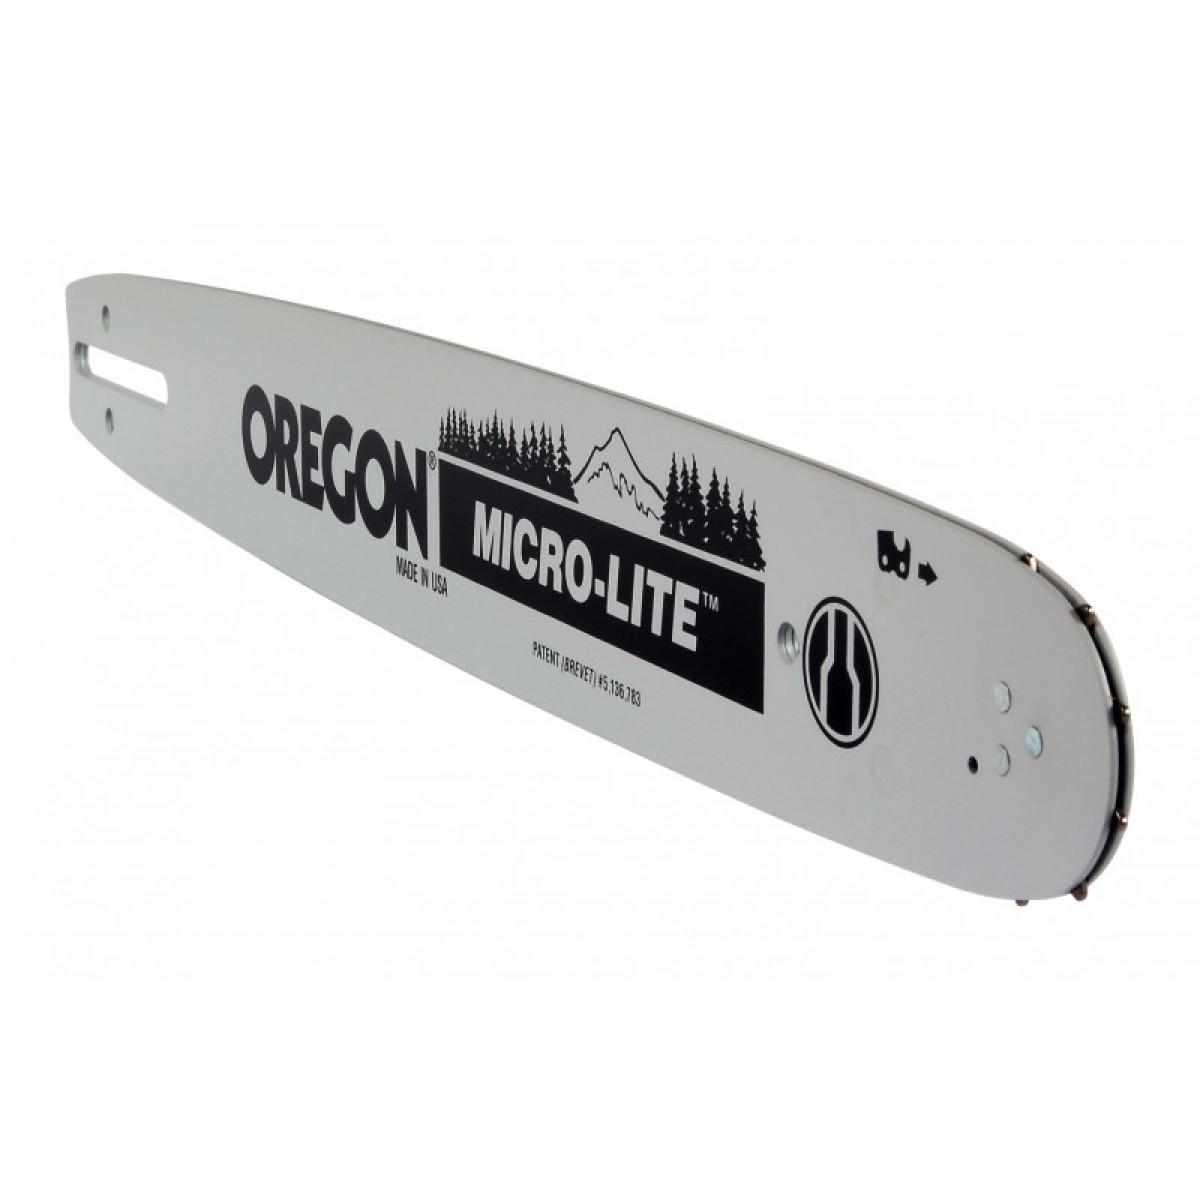 "Vodící lišta MICRO-LITE 13"" (33cm) .325"" 1,3mm 130MPBK095"